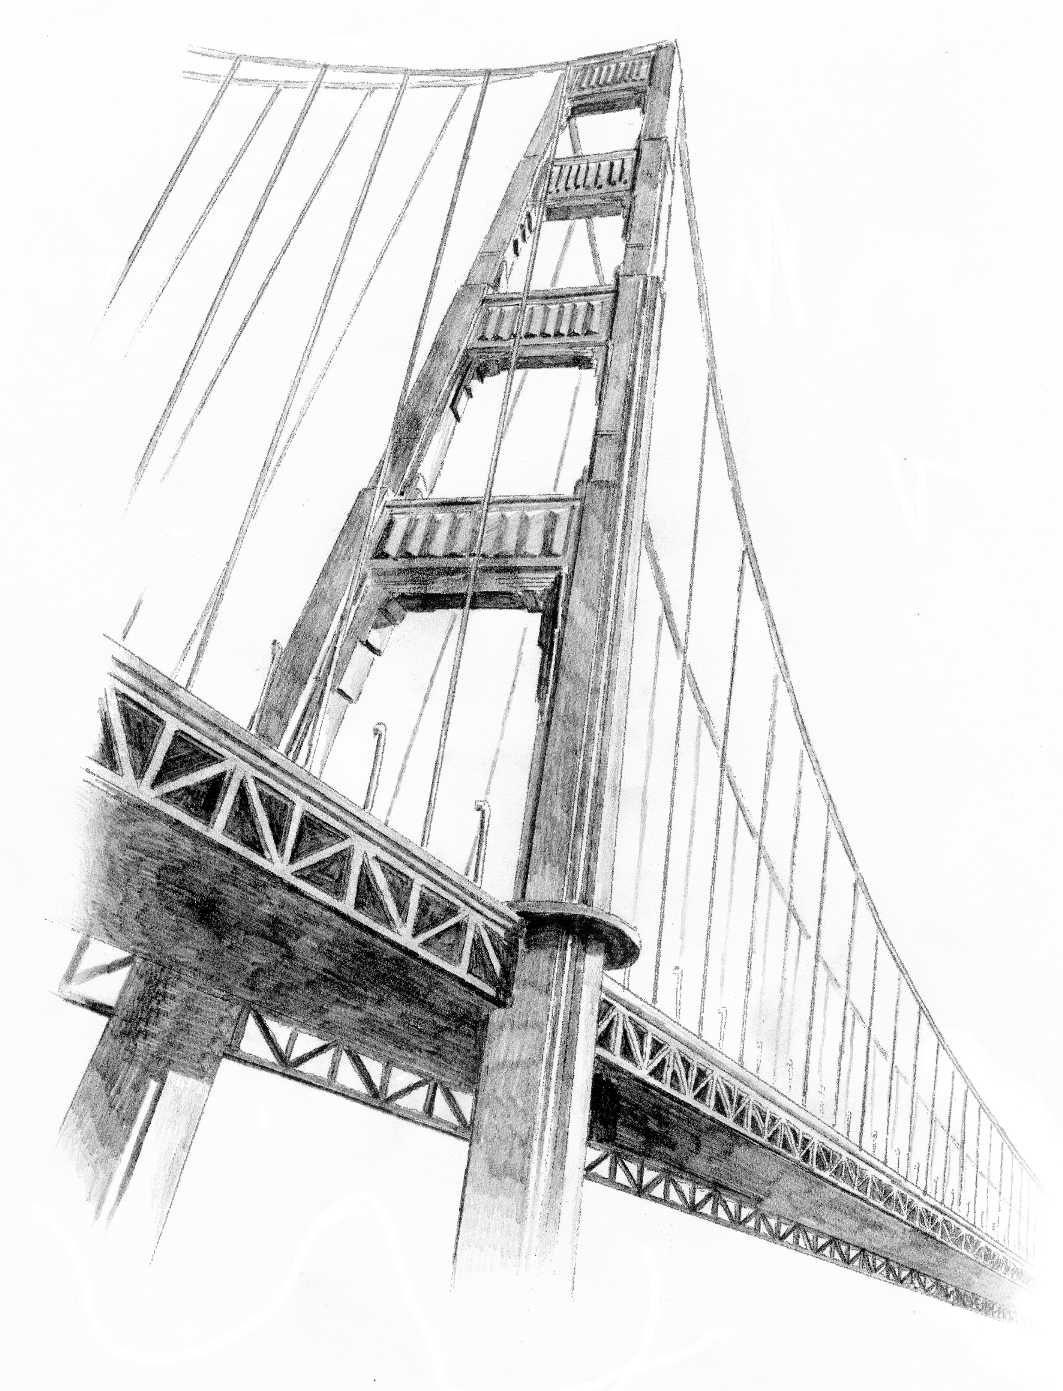 An unusual view of the Golden Gate Bridge, San Francisco